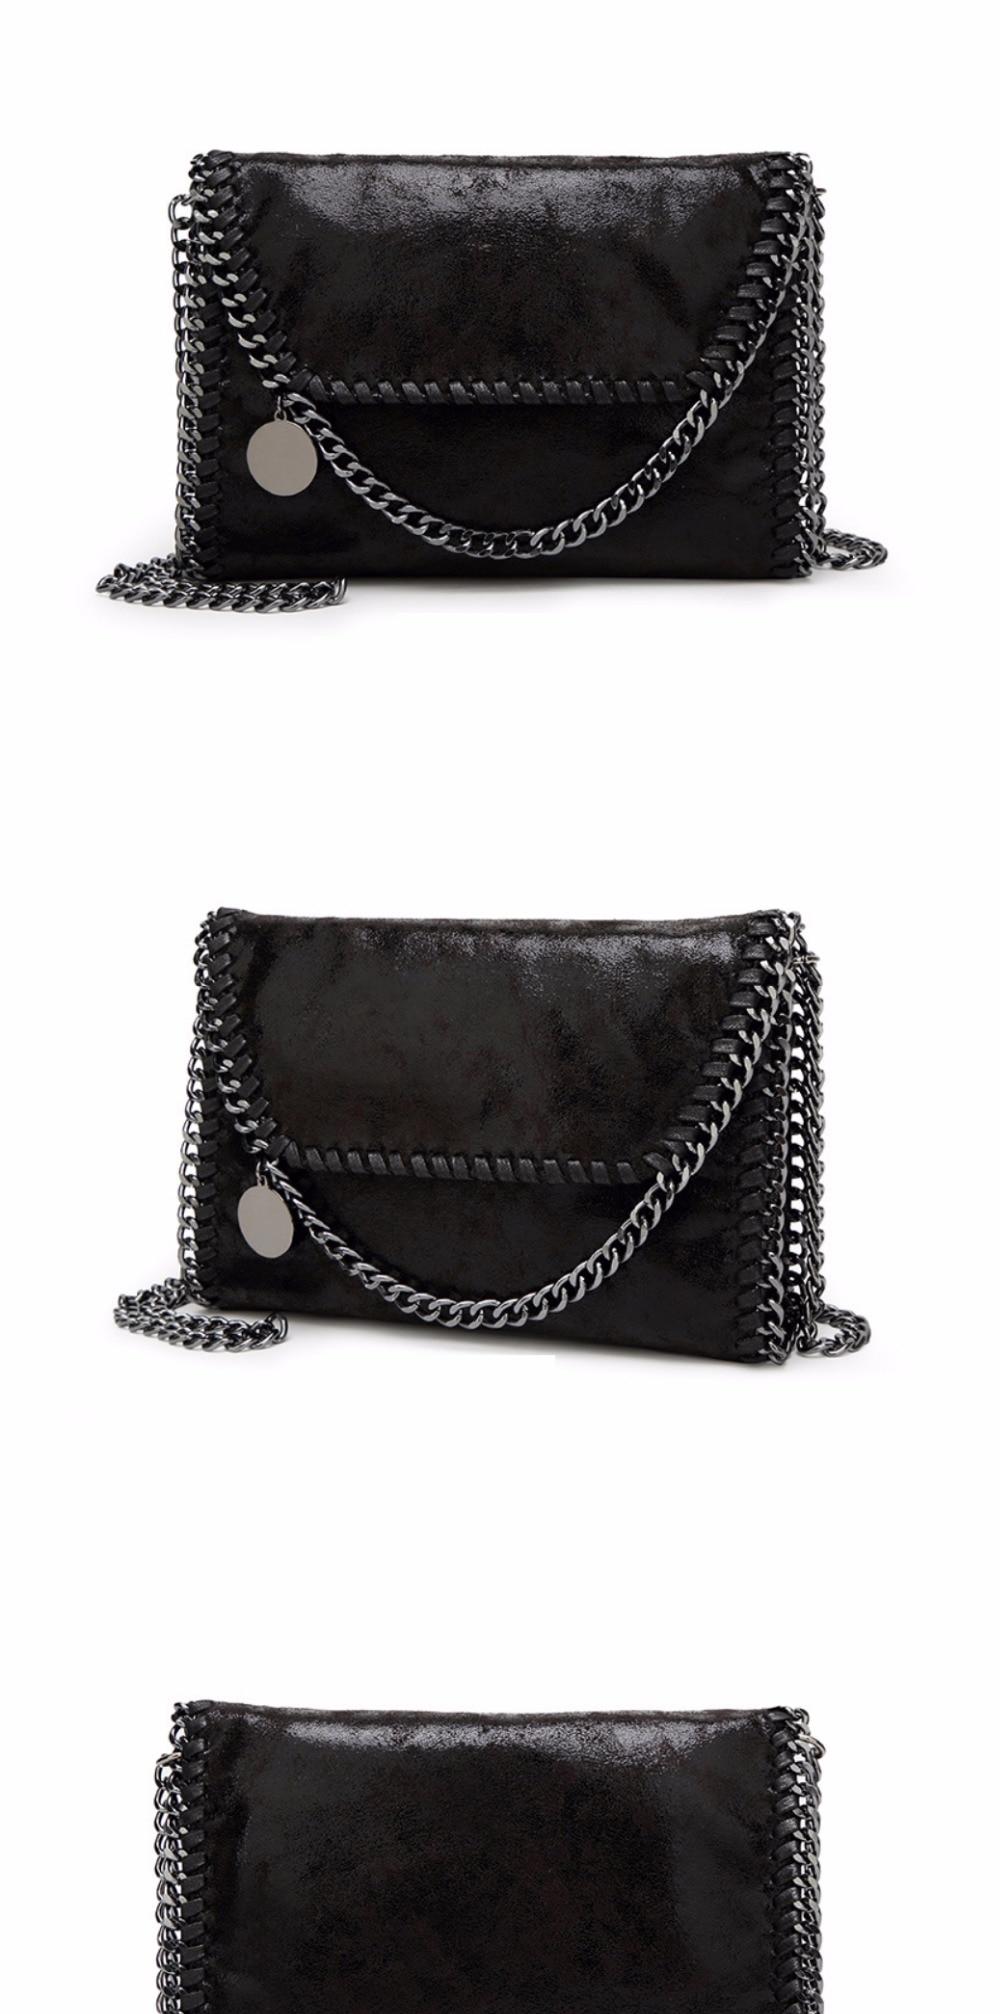 Chain bag (1)